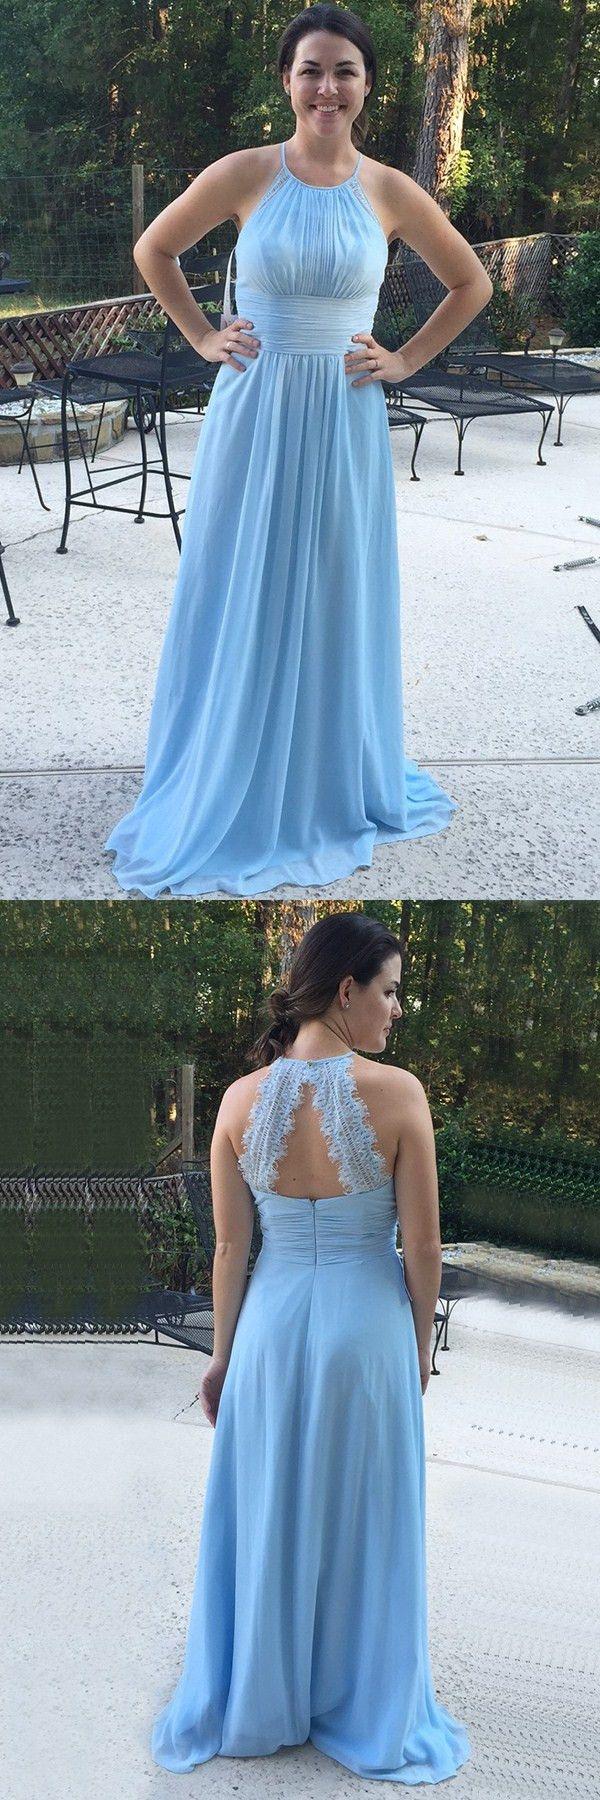 250 best party dresses images on Pinterest